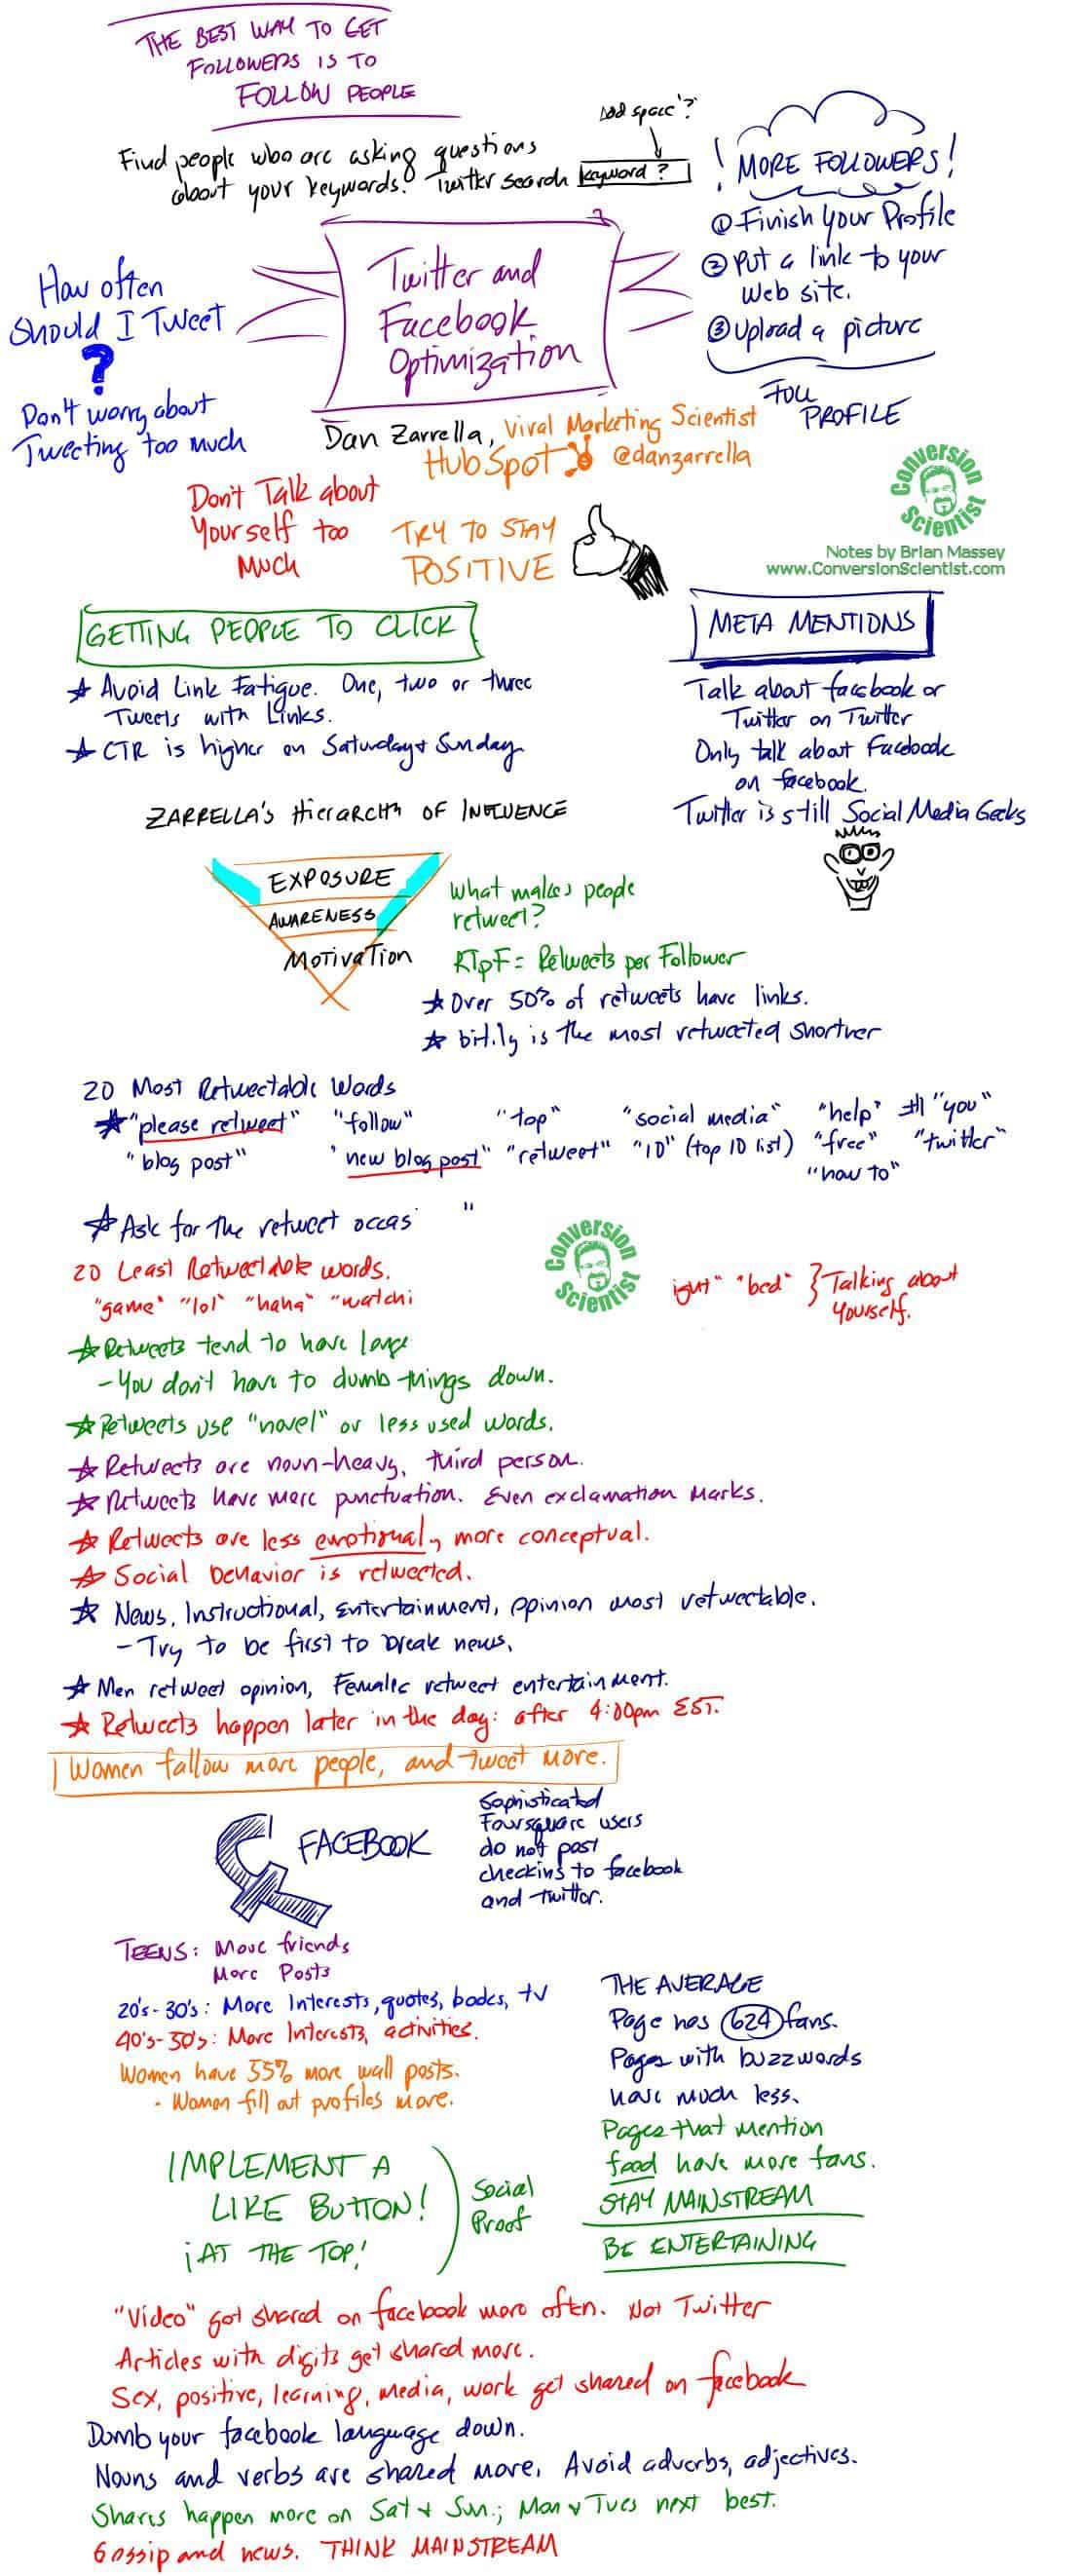 Dan Zarrella Twitter and Facebook Optimization Notes.